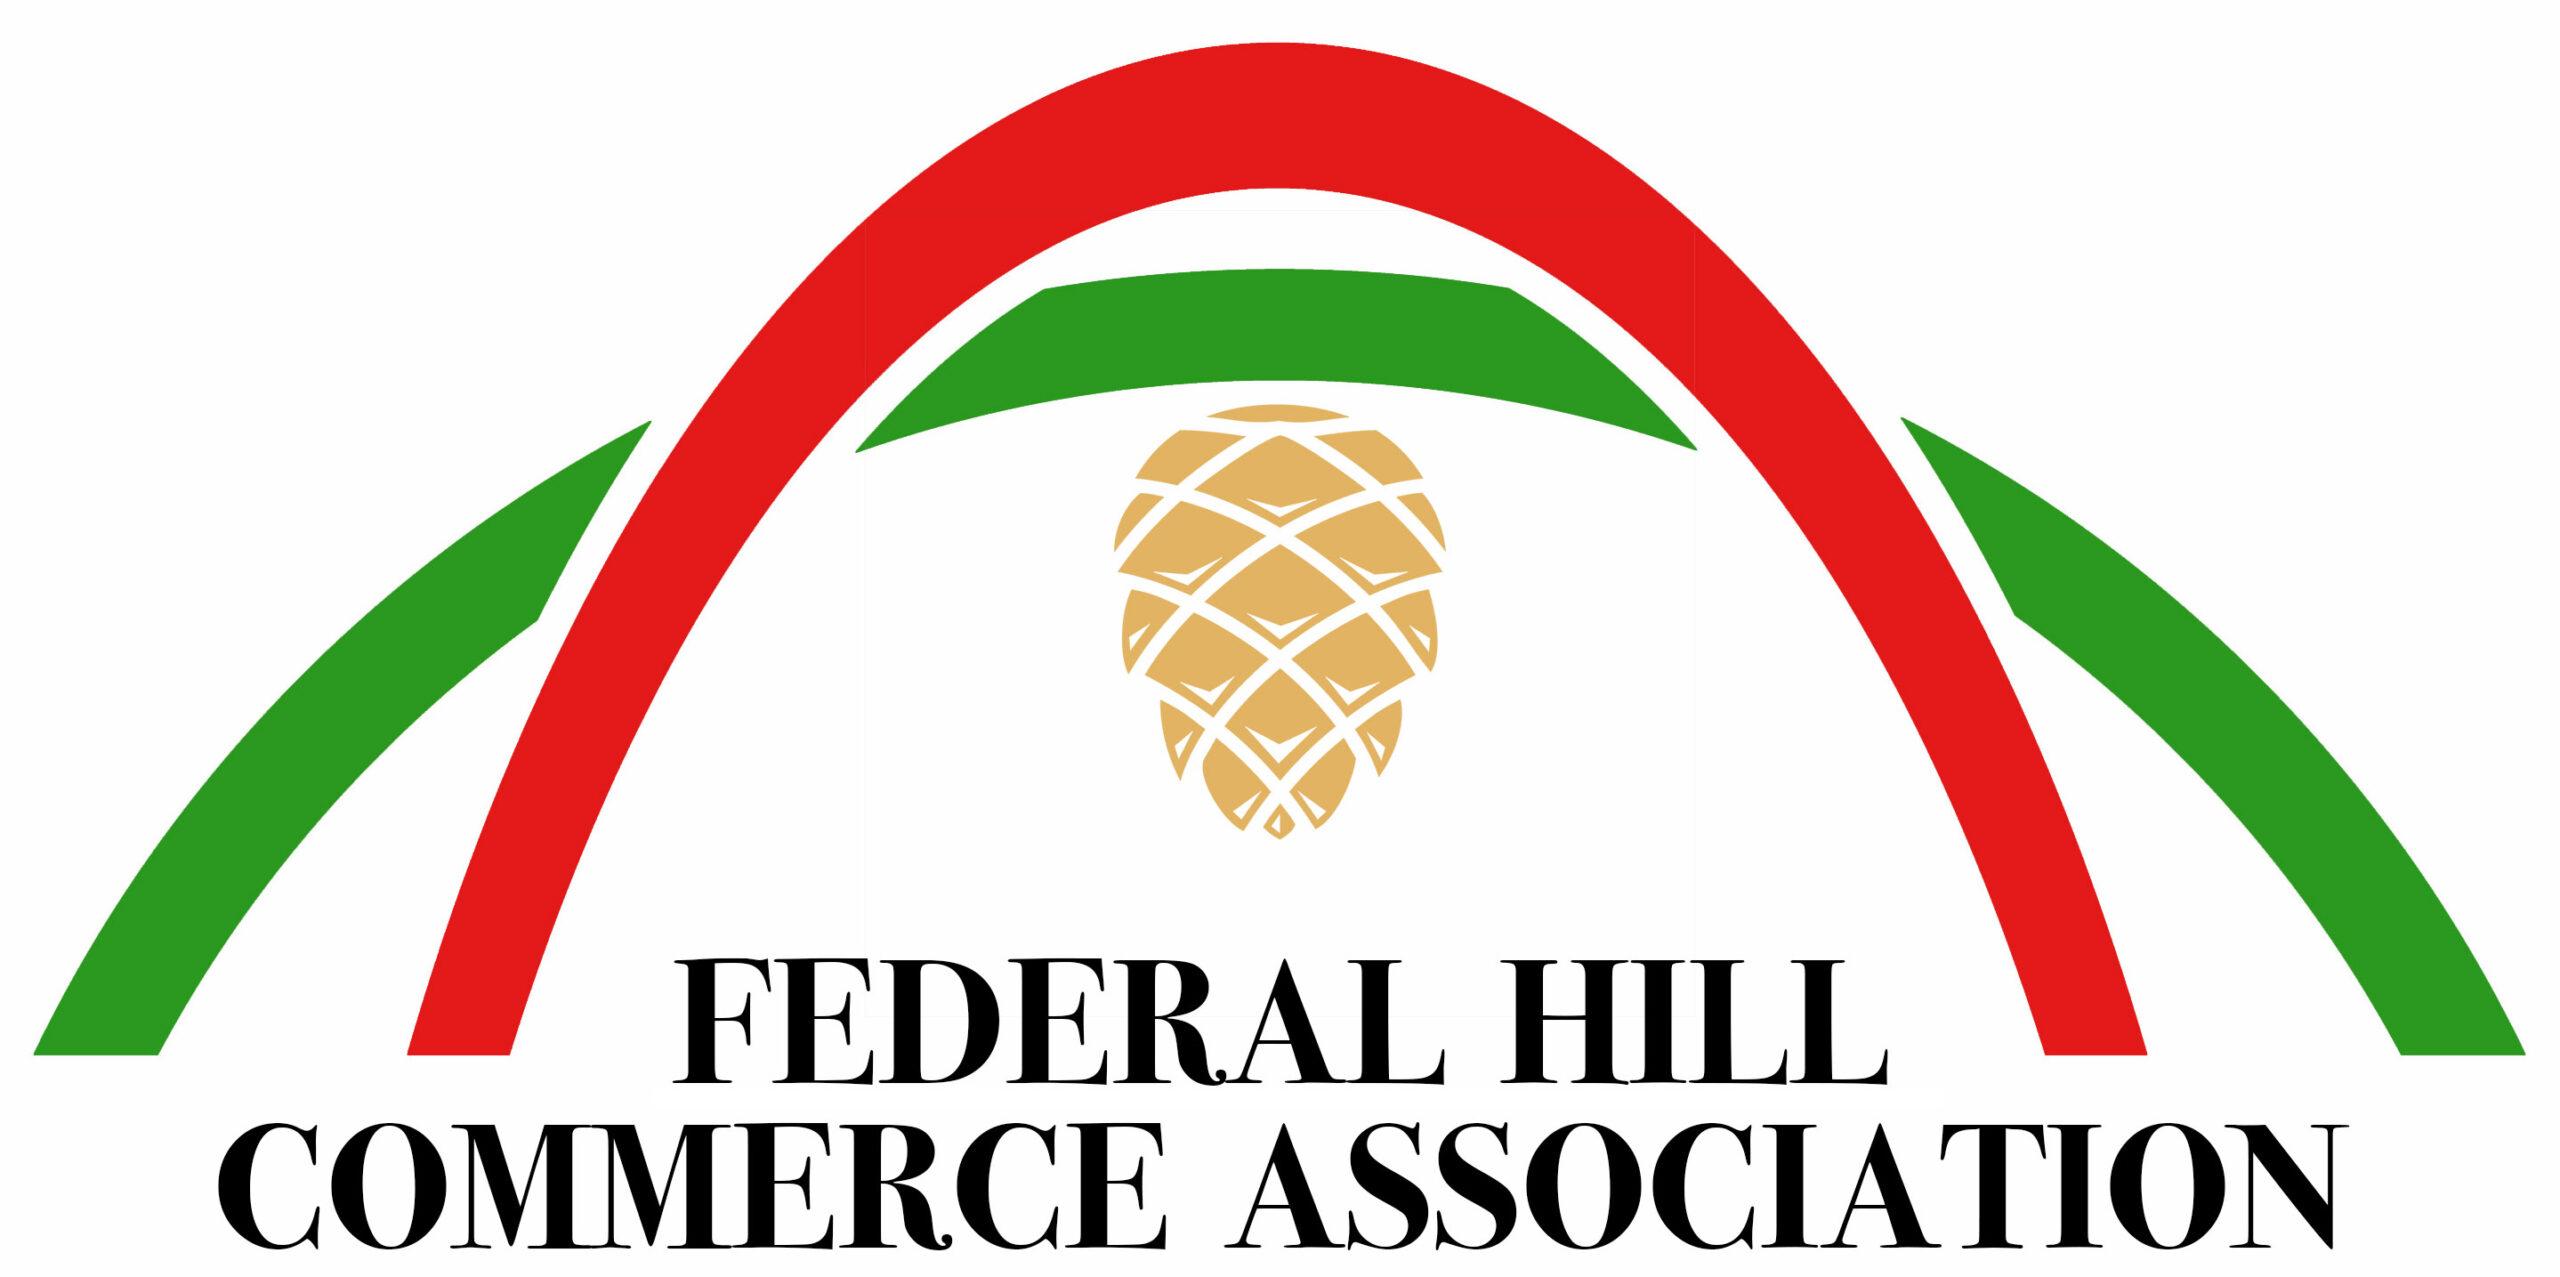 federal hill commerce association logo 2021